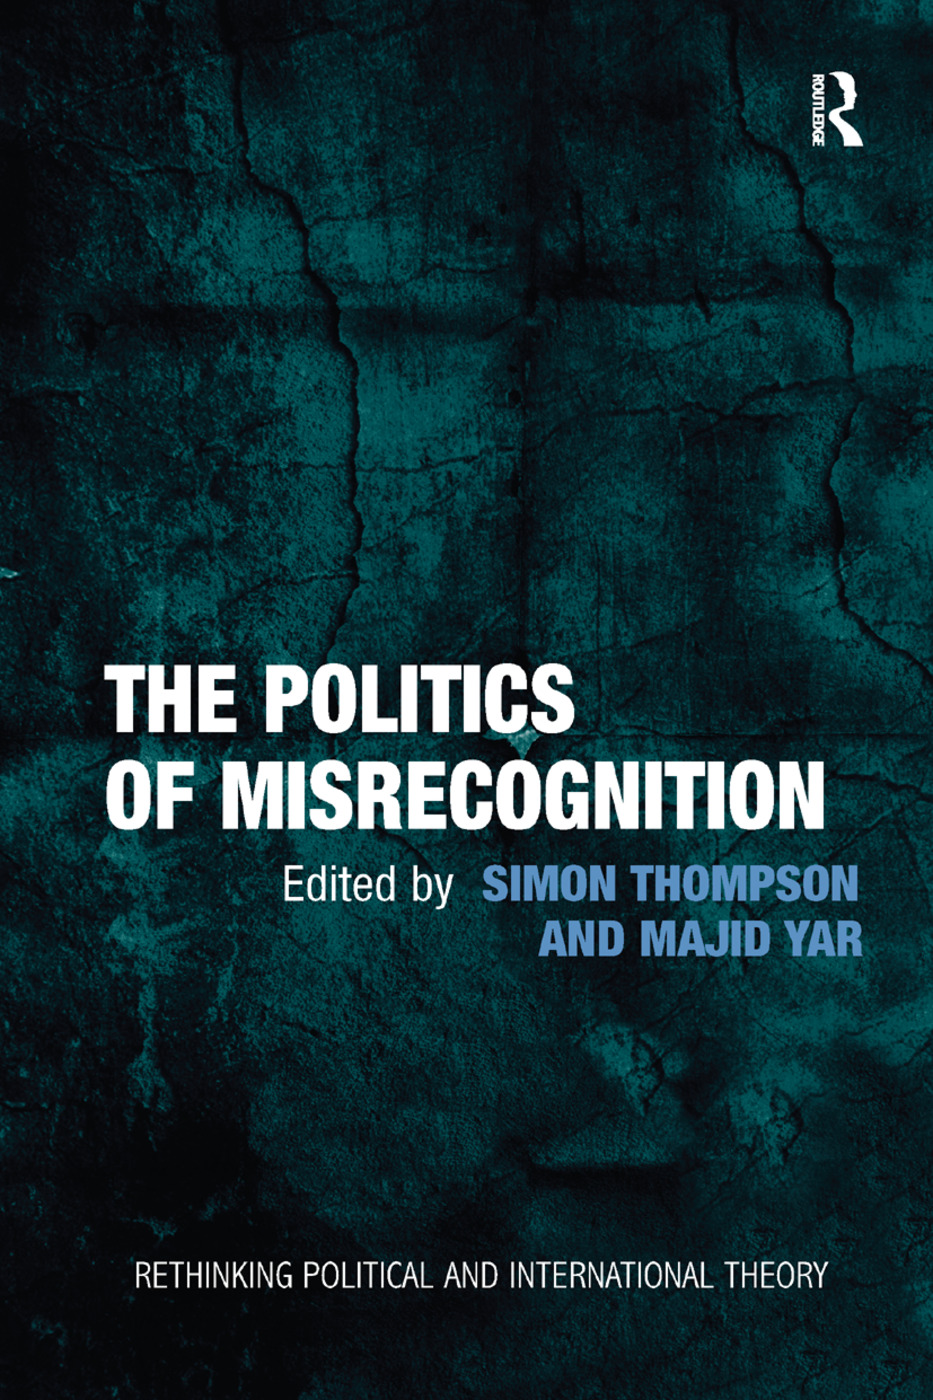 The Politics of Misrecognition book cover